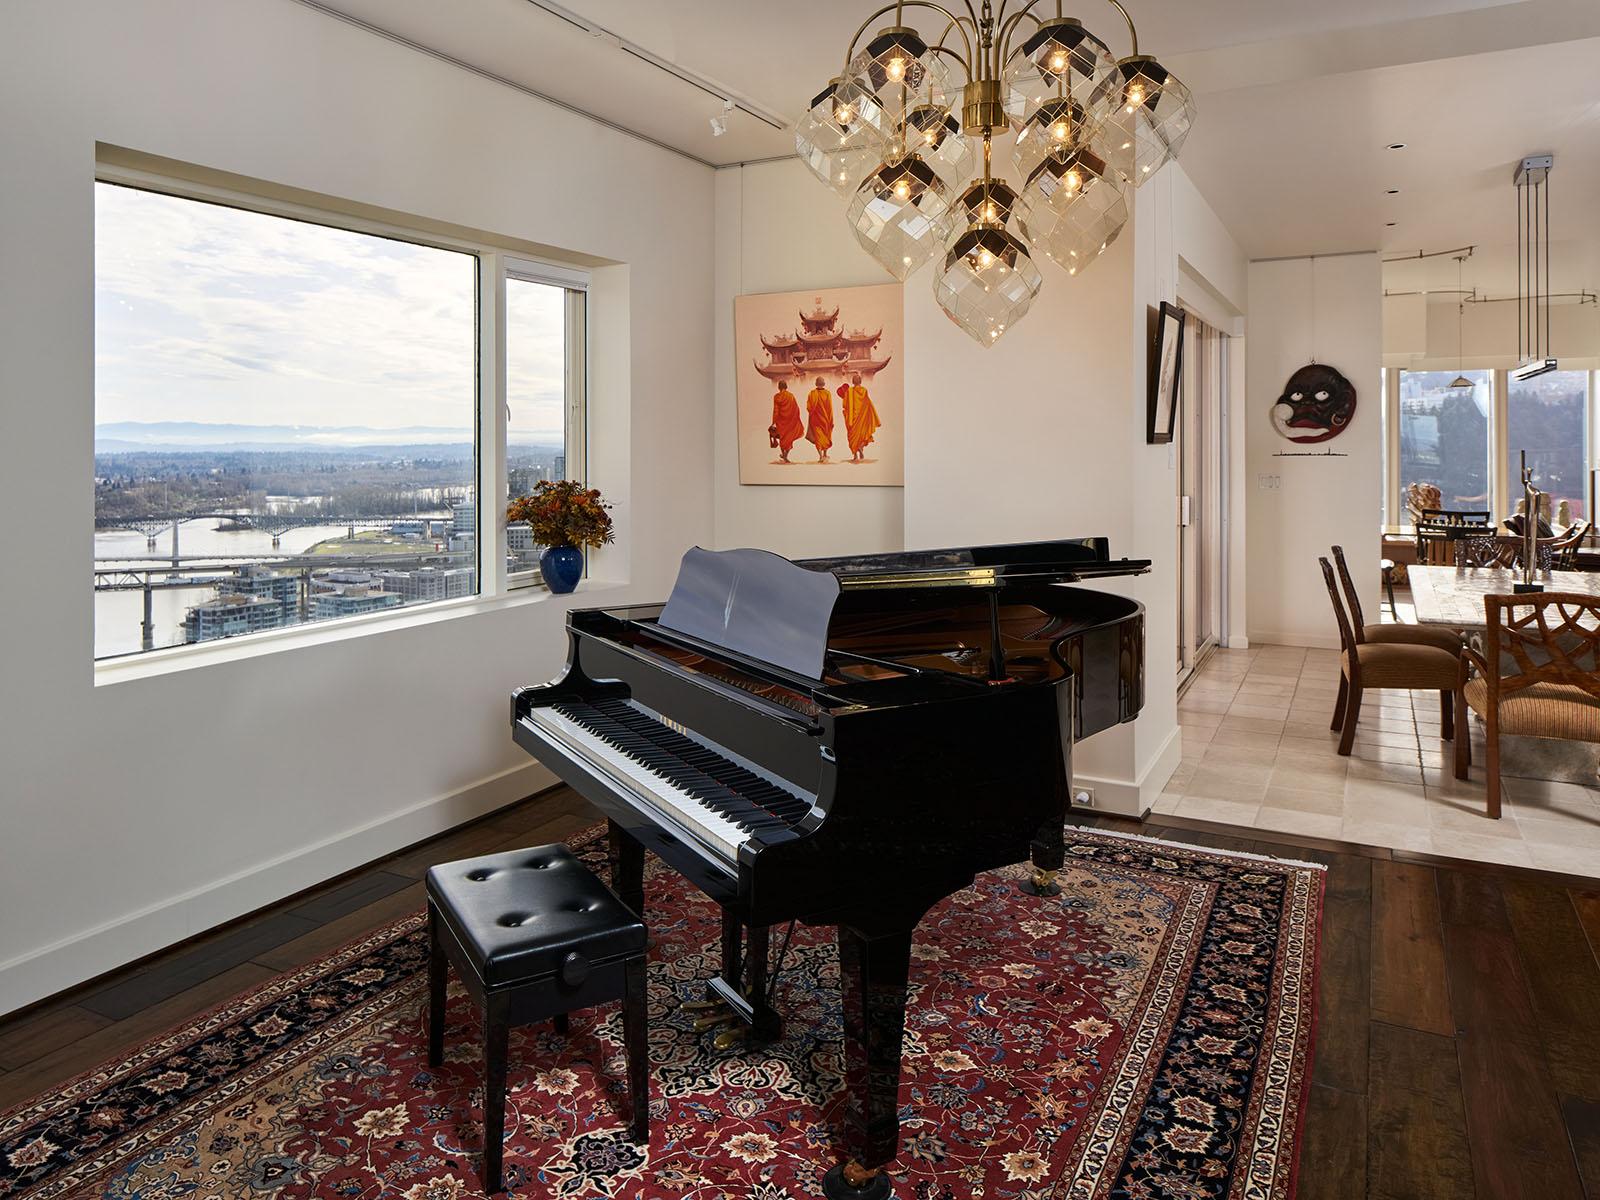 Piano room, 180 degree view of Willamette river